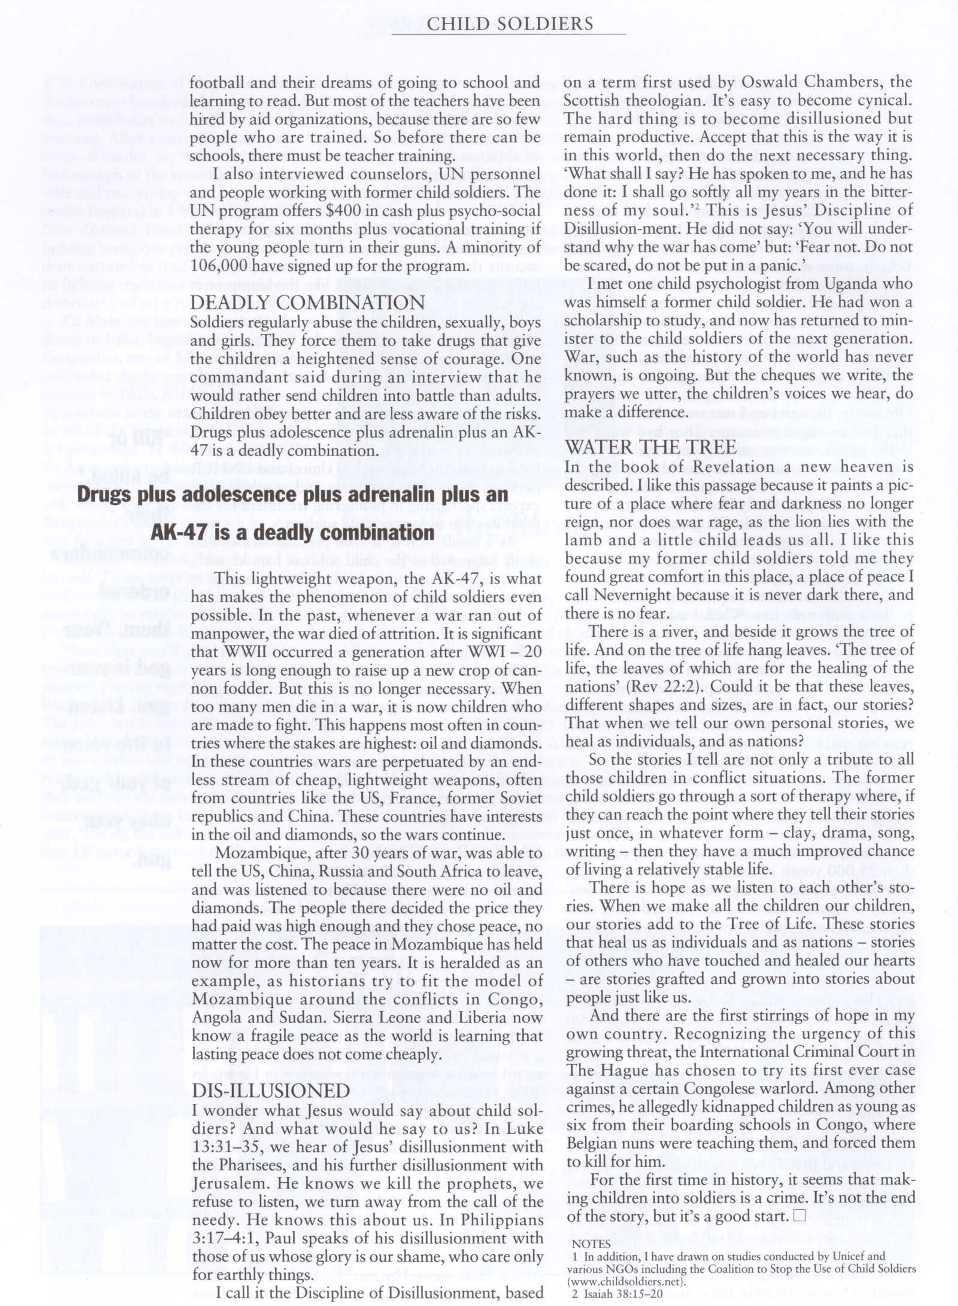 story-page-2.jpg